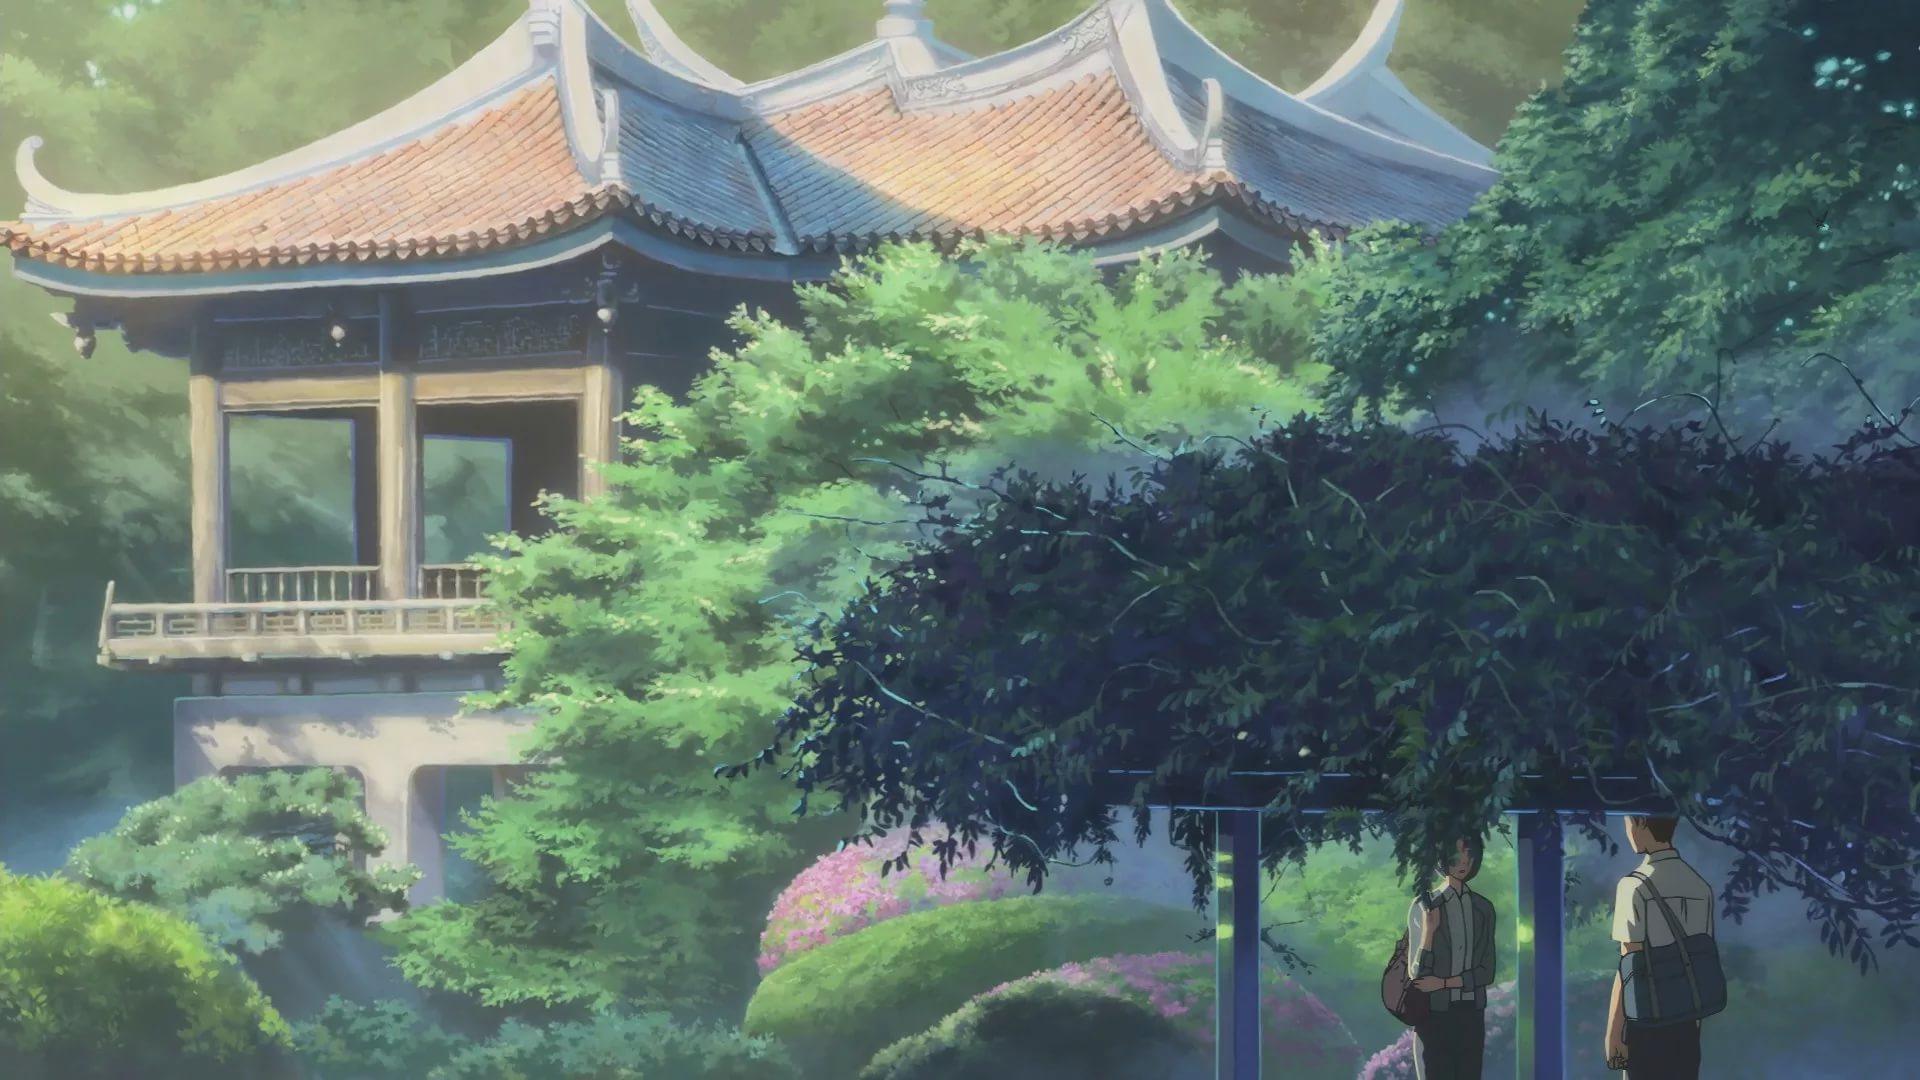 The Garden Of Words Makoto Shinkai Hintergrund 42699935 Fanpop